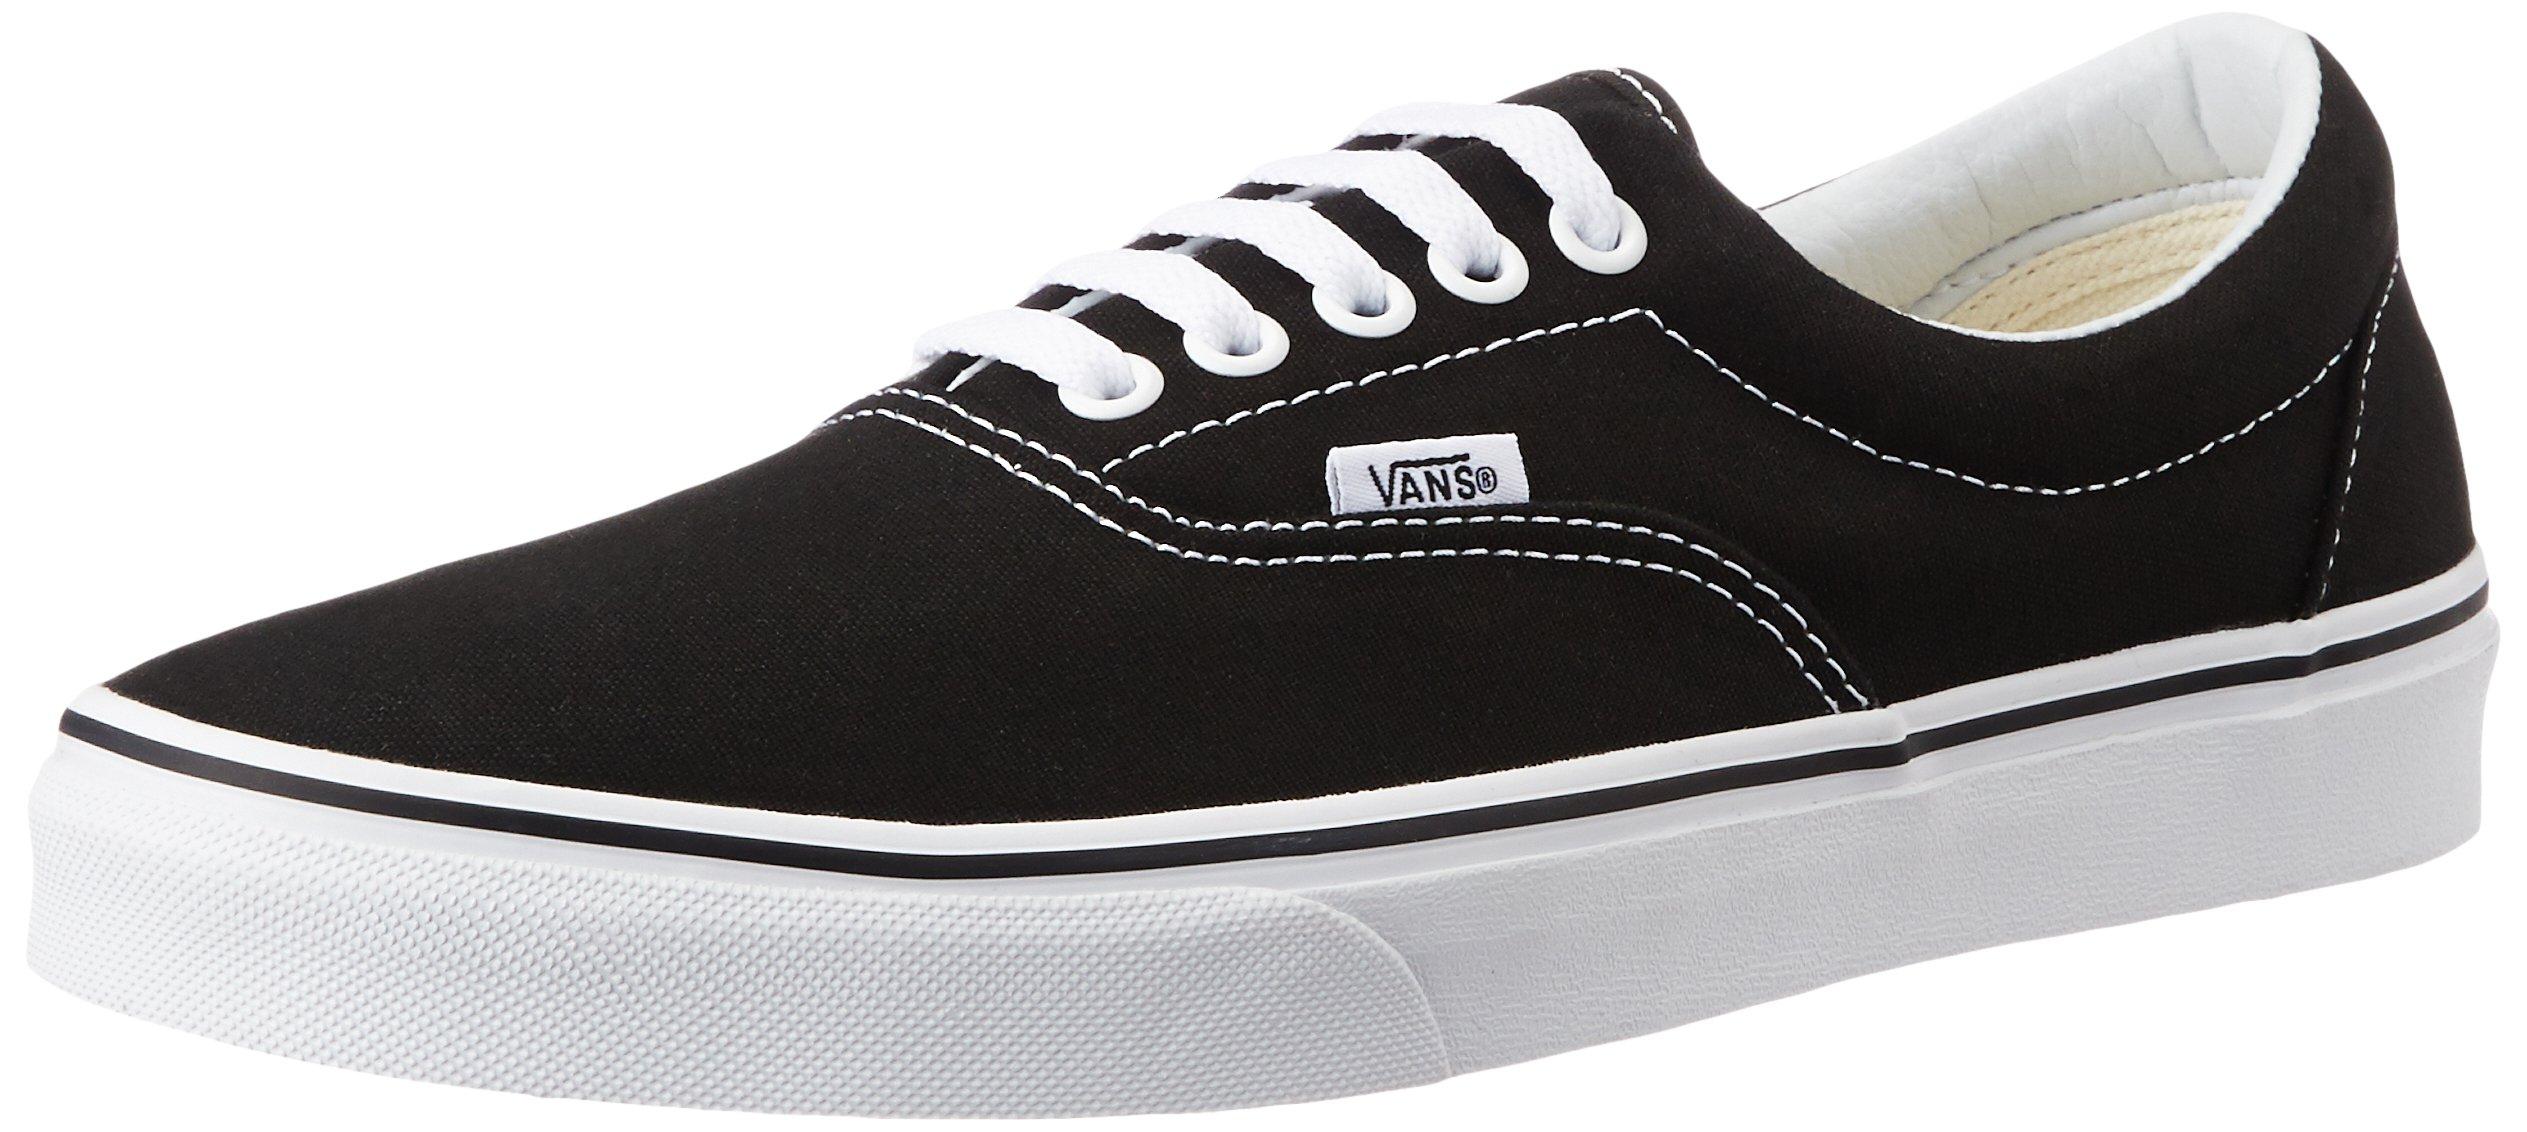 Vans Unisex Era Leather Sneakers